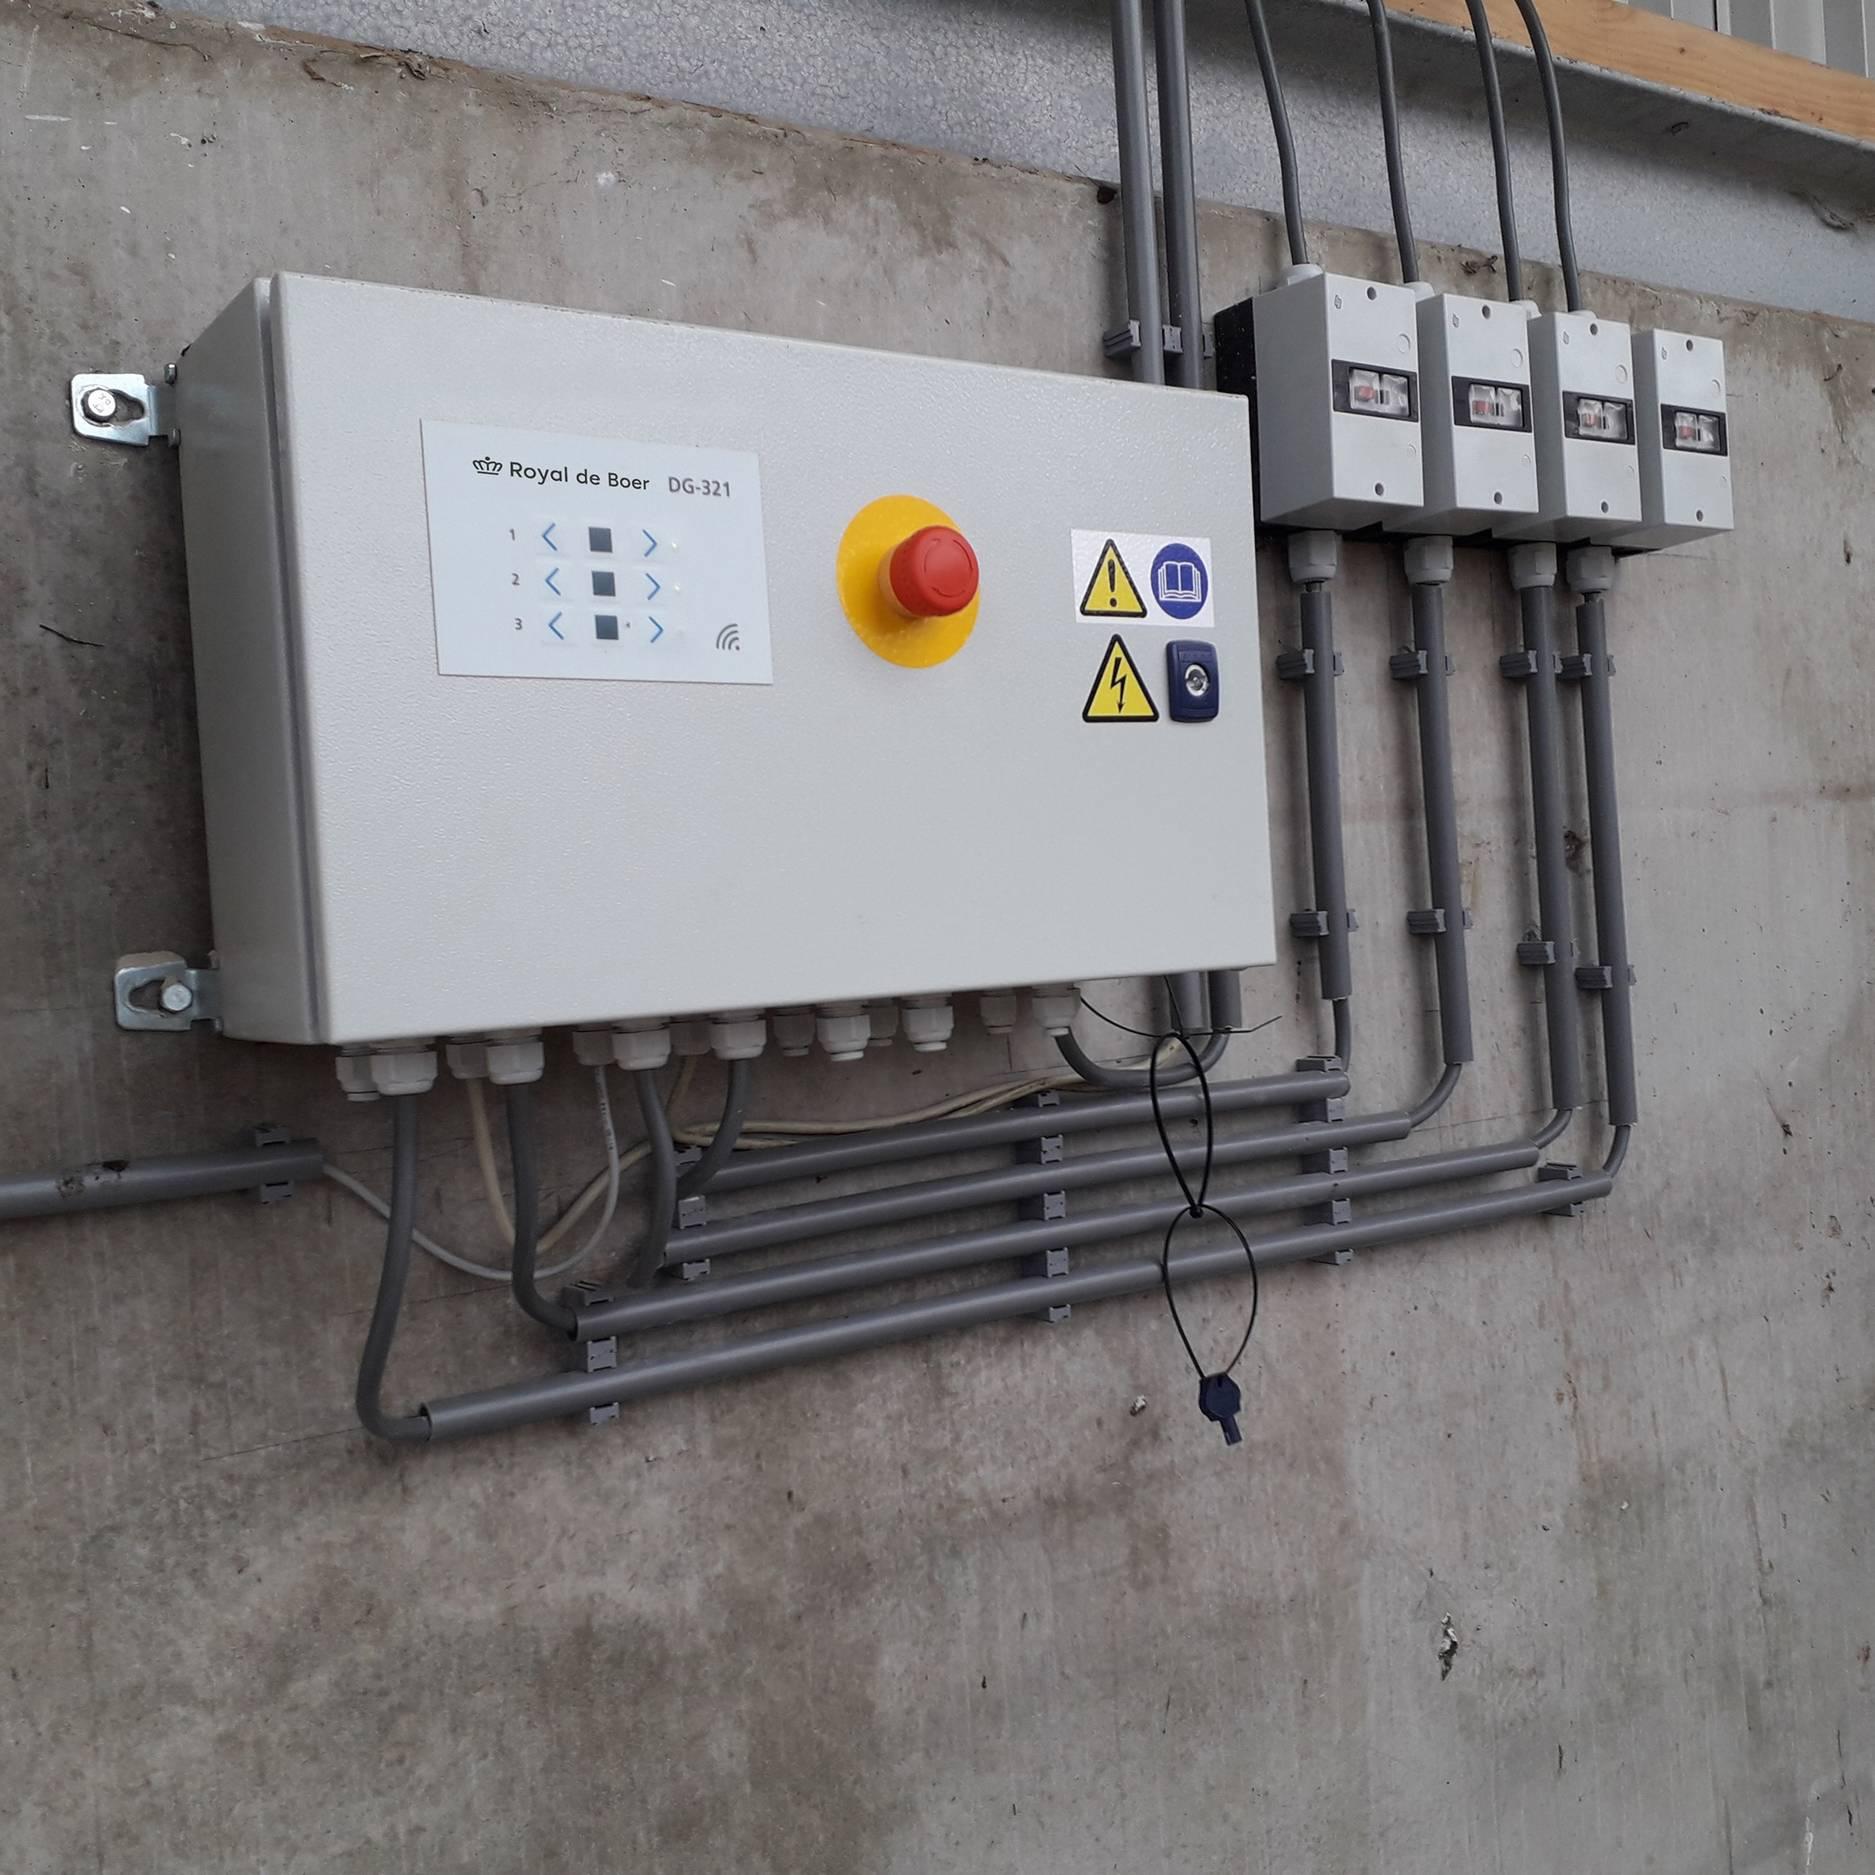 DG-321 control box for manure scrapers